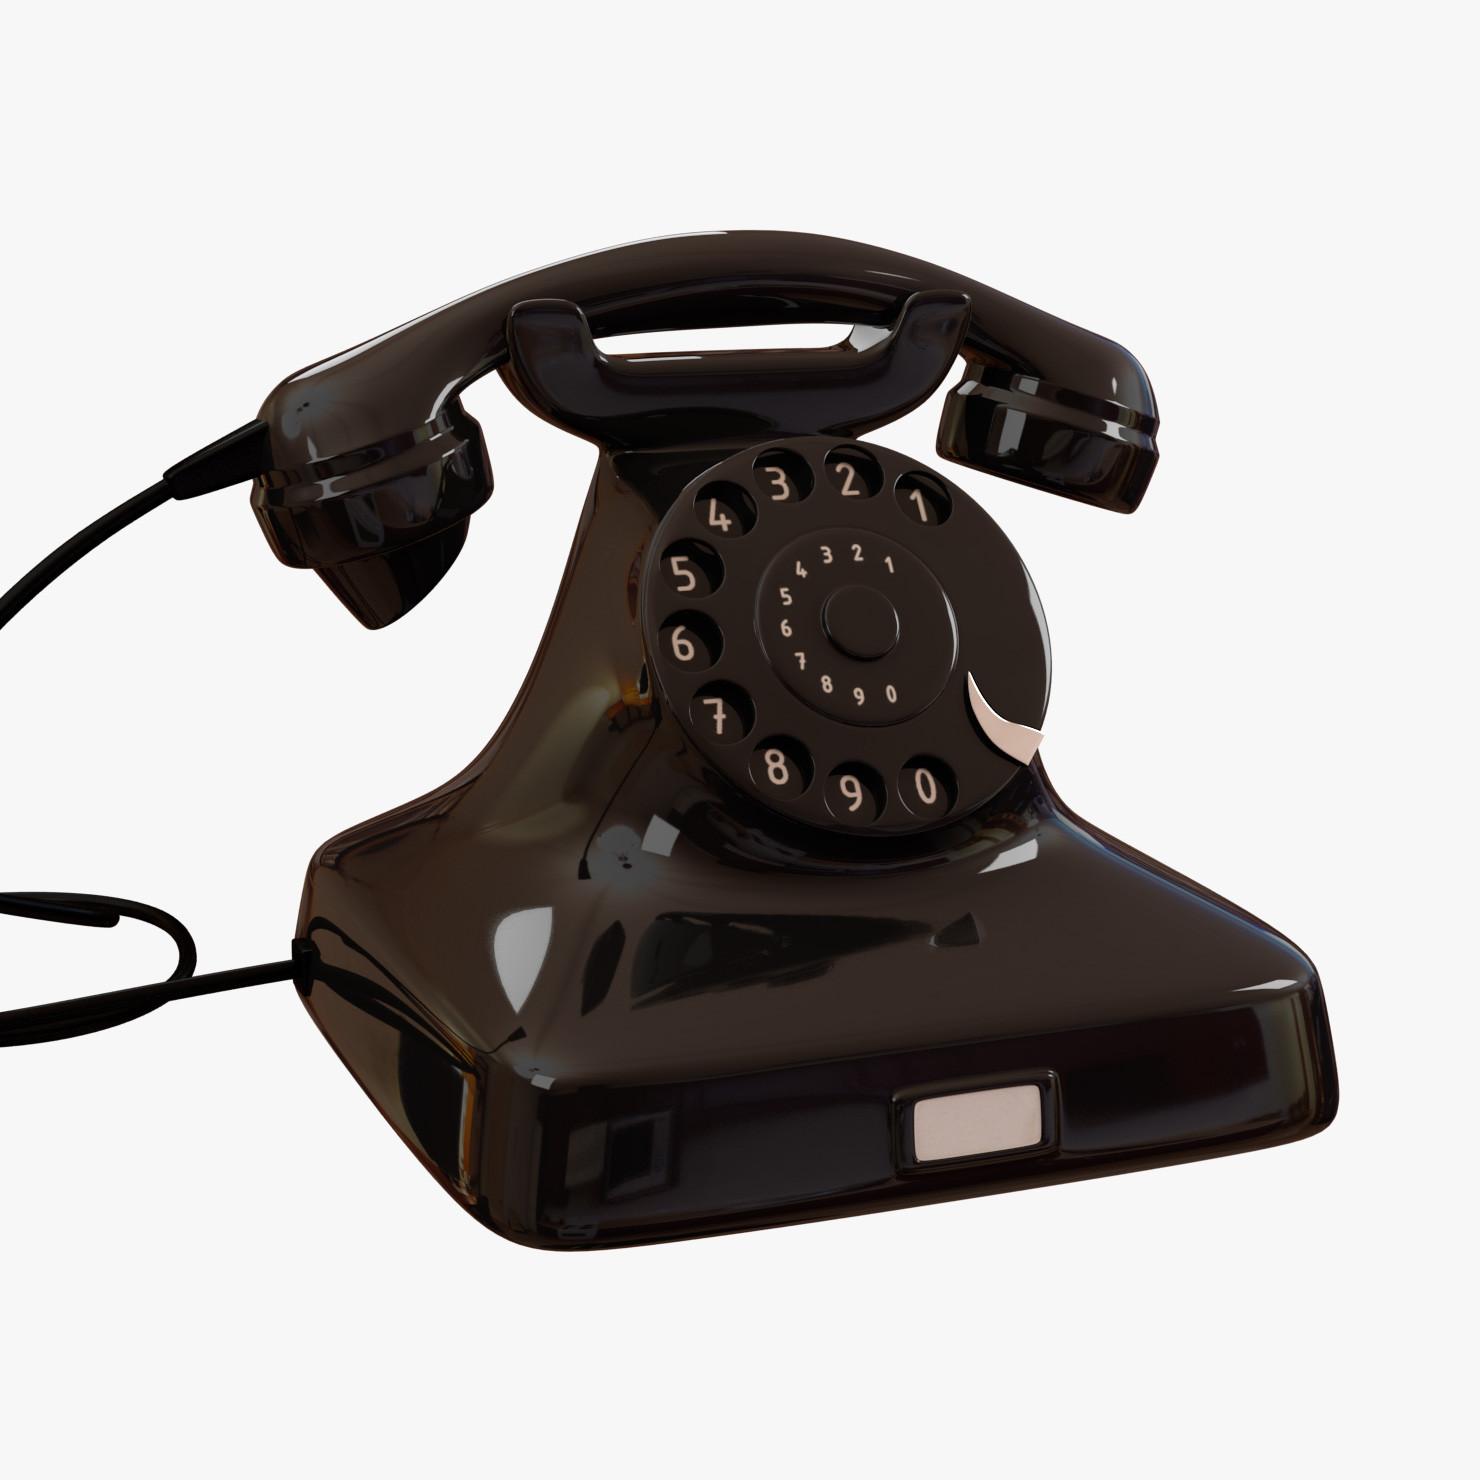 obj_deskTelephone_sig.jpg